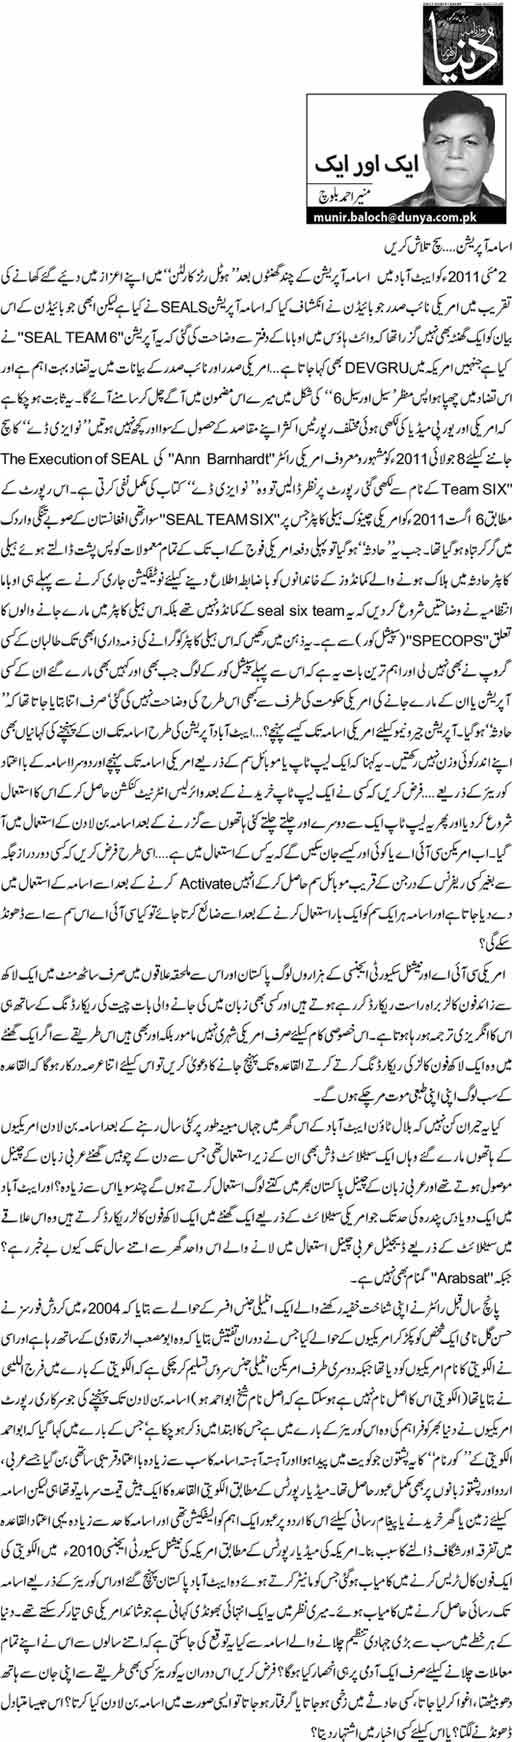 Osama operation....Such talash karain - Munir Ahmed Baloch